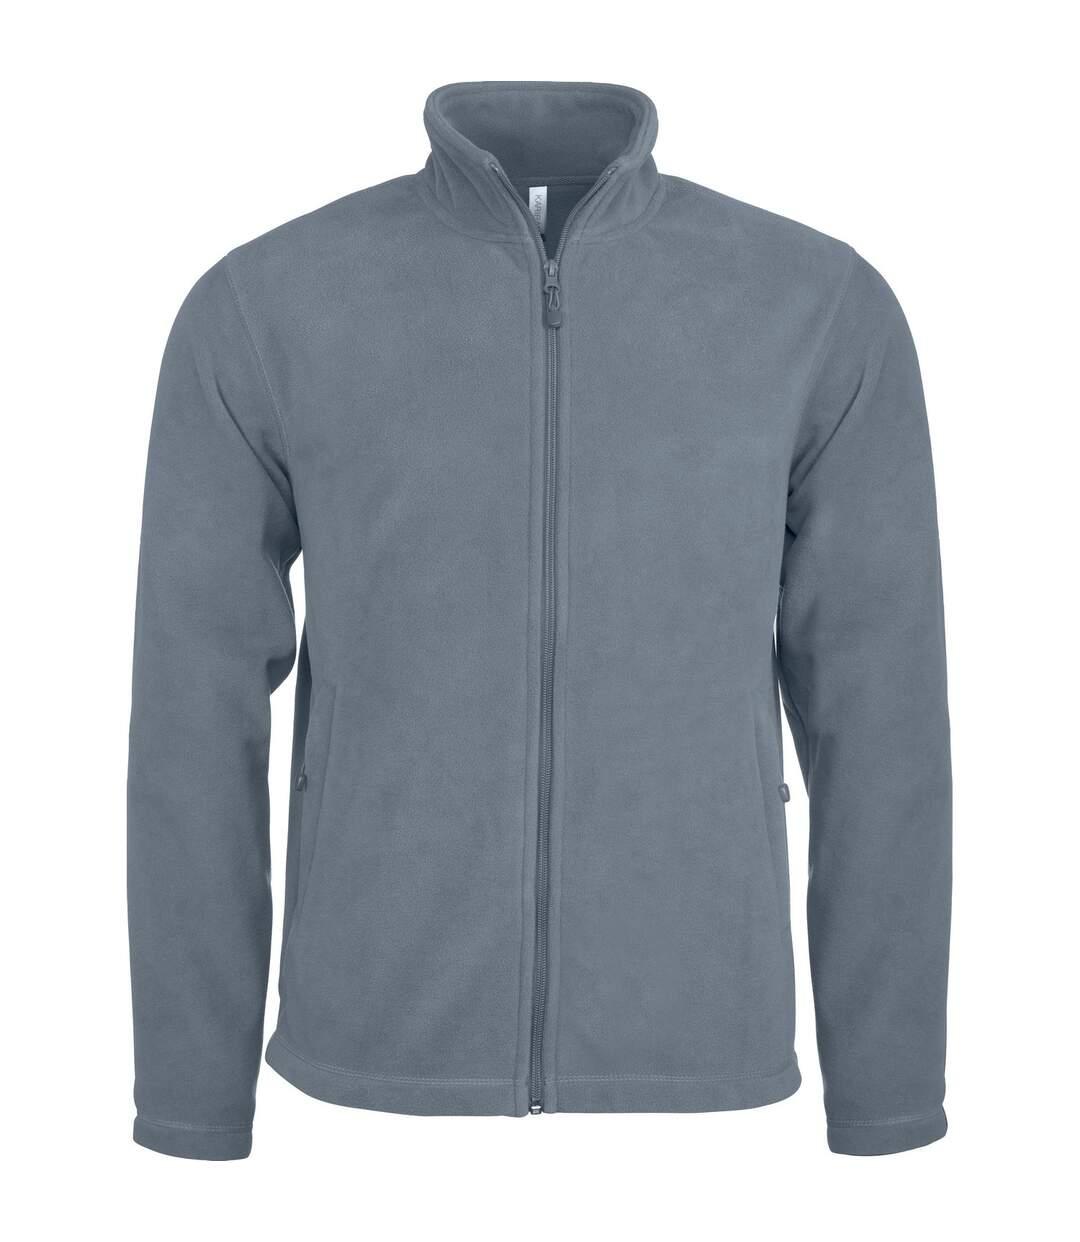 Kariban Mens Full Zip Anti Pill Microfleece Jacket (Convoy Grey) - UTRW4222